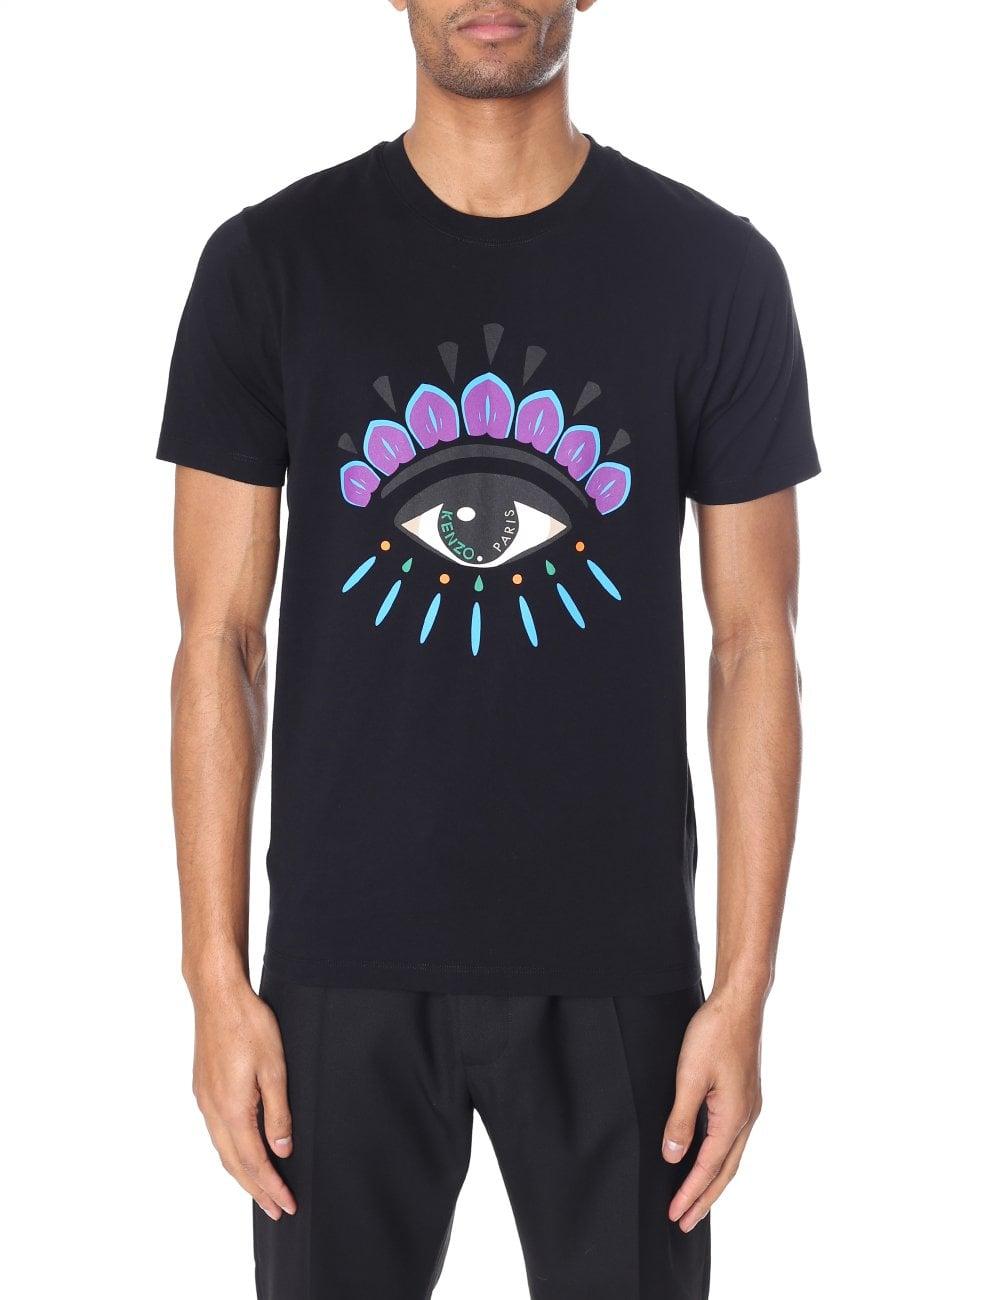 4d72966d21 Kenzo Men's Eye Tee